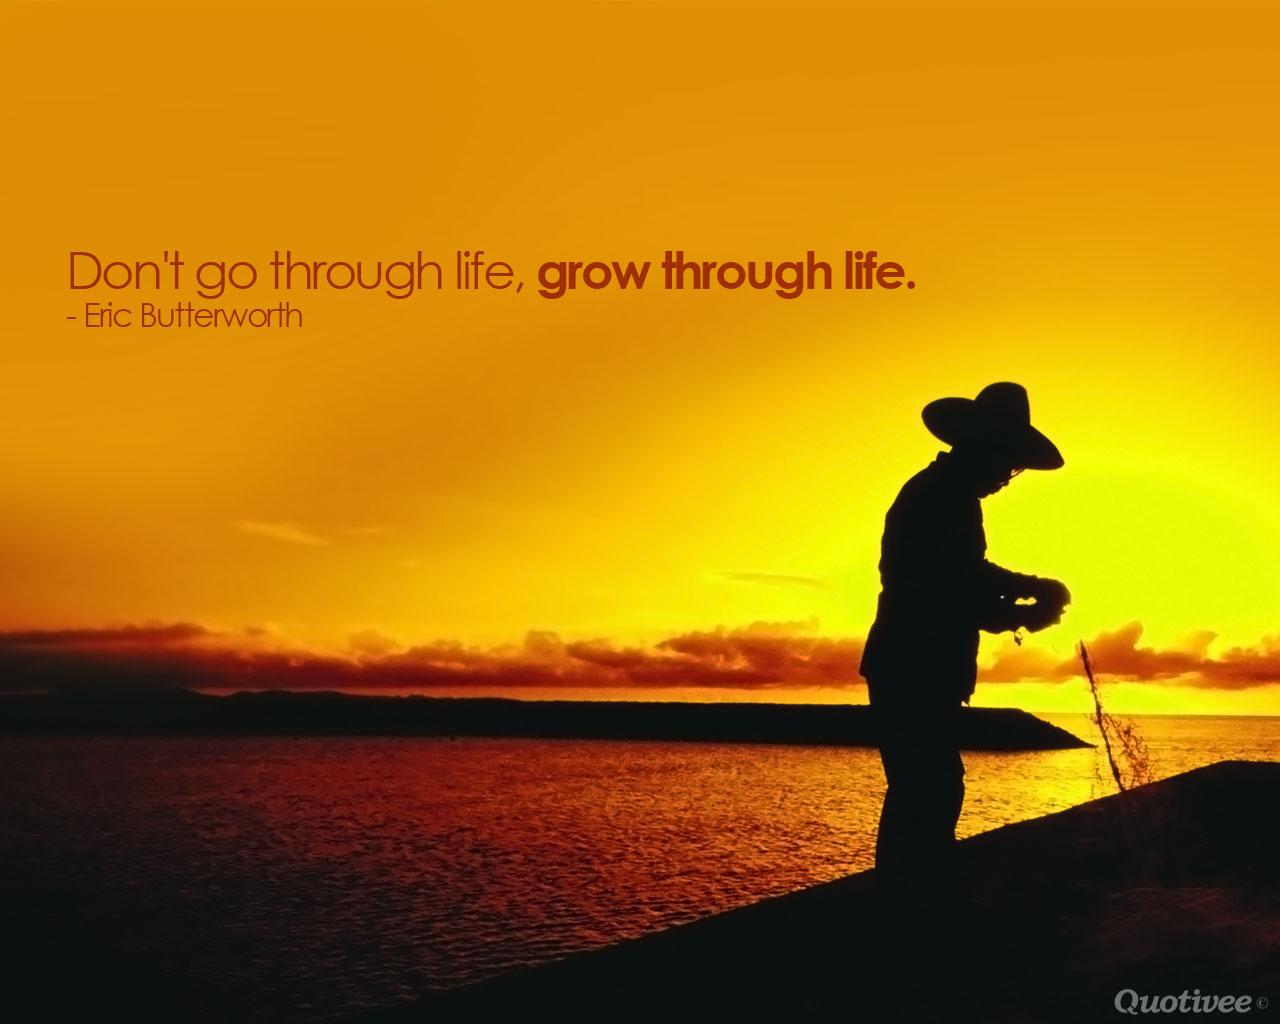 Inspirational Wallpaper on Life: Don't go through life grow through life.